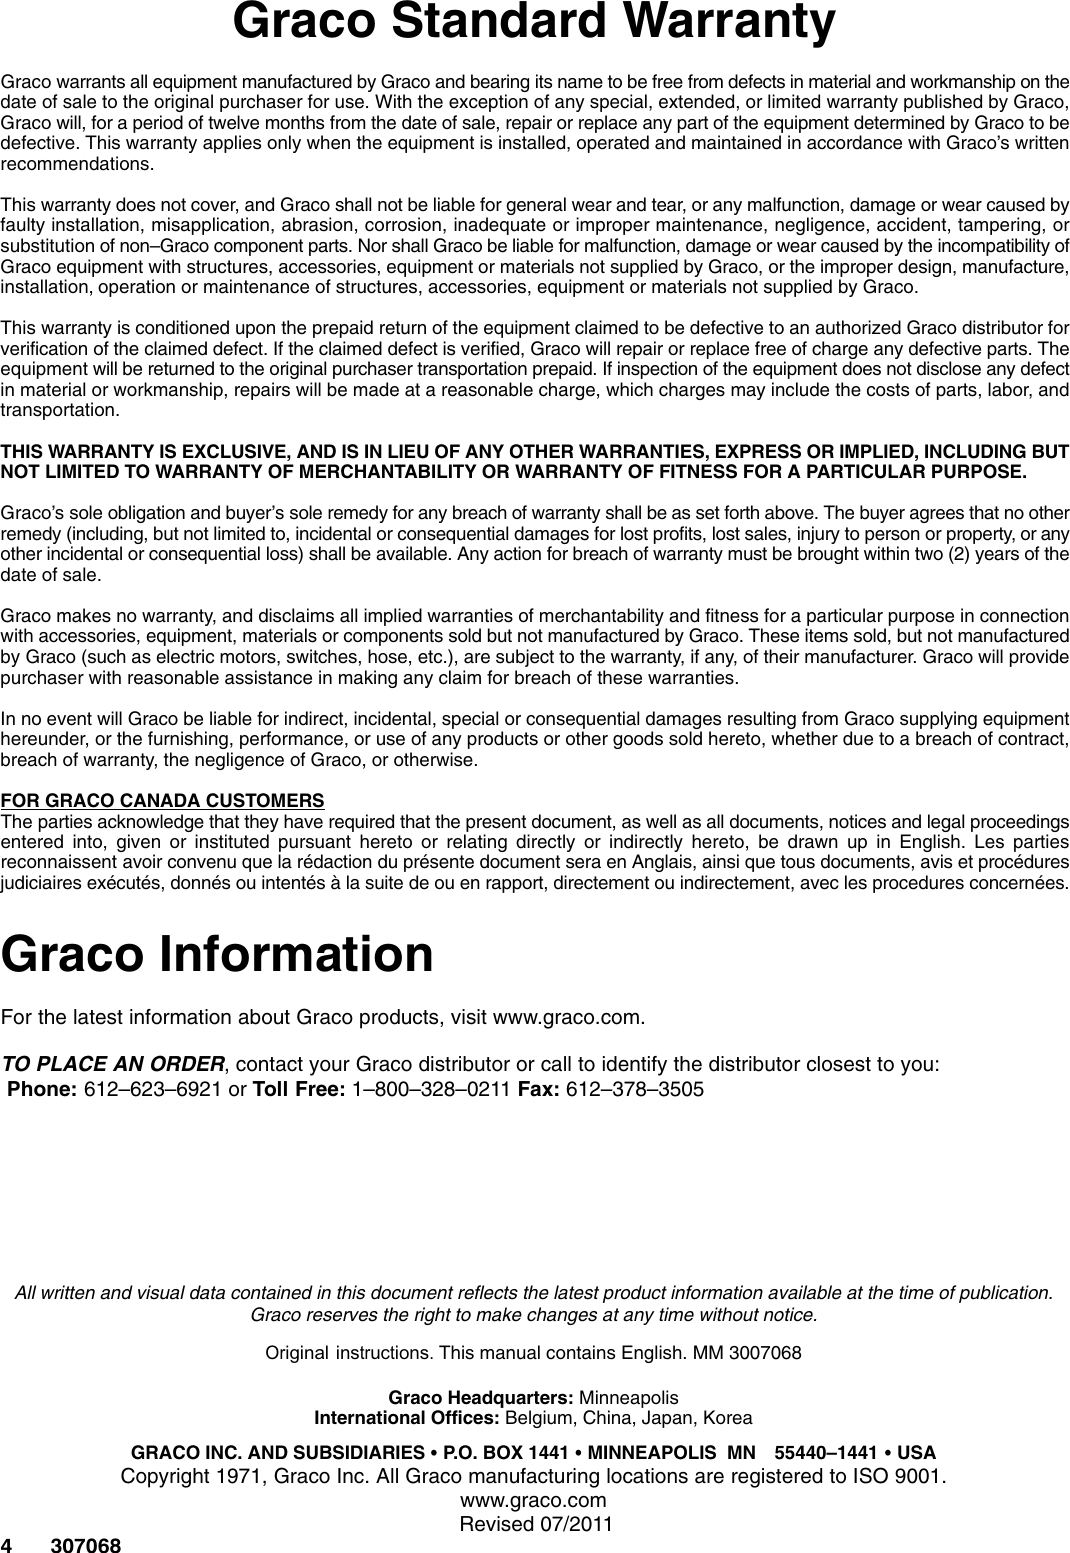 Graco 307068U Low Pressure Ball Valves Users Manual Valves, Nickel